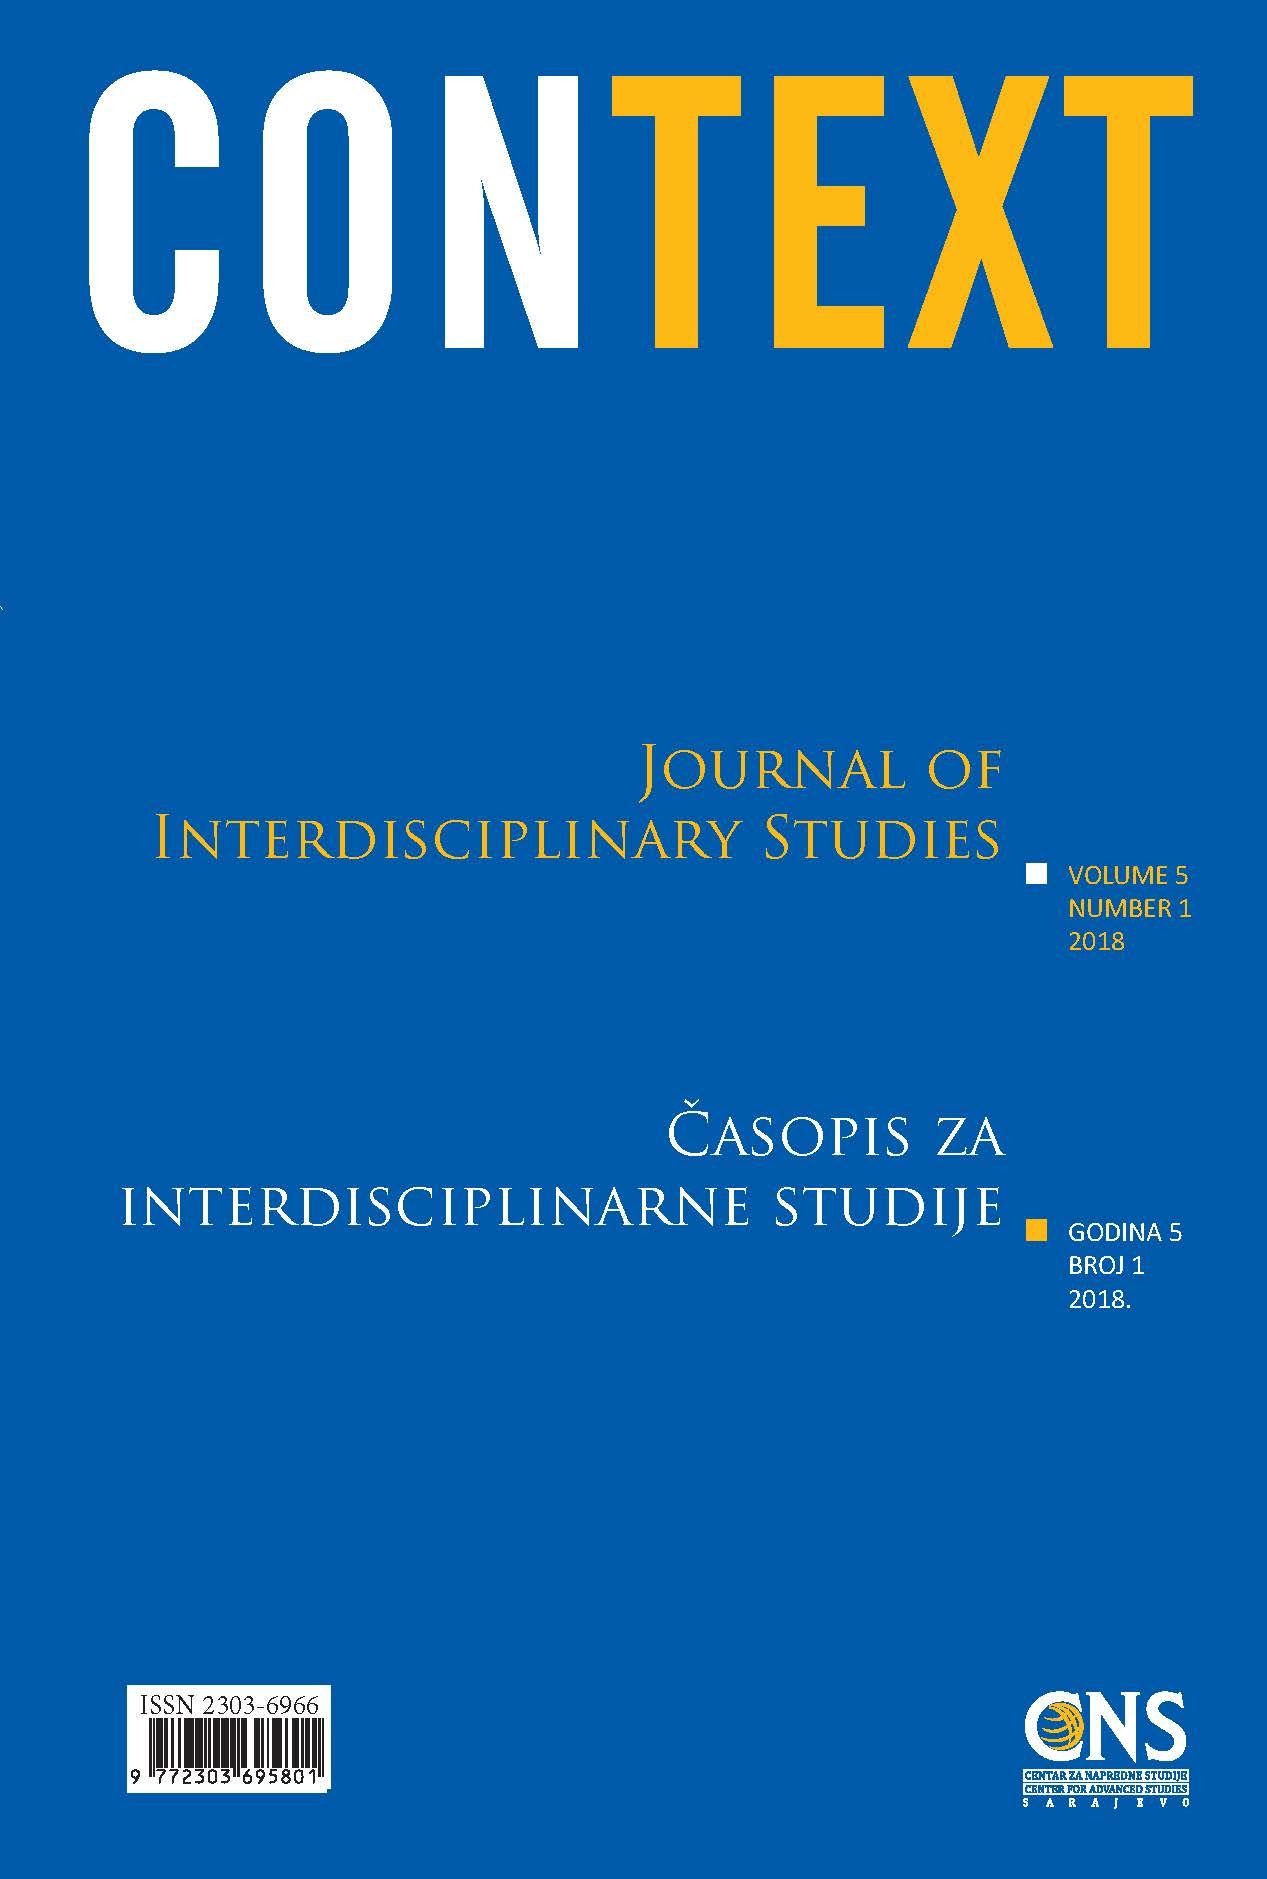 View Vol. 5 No. 1 (2018): Context: Journal of Interdisciplinary Studies